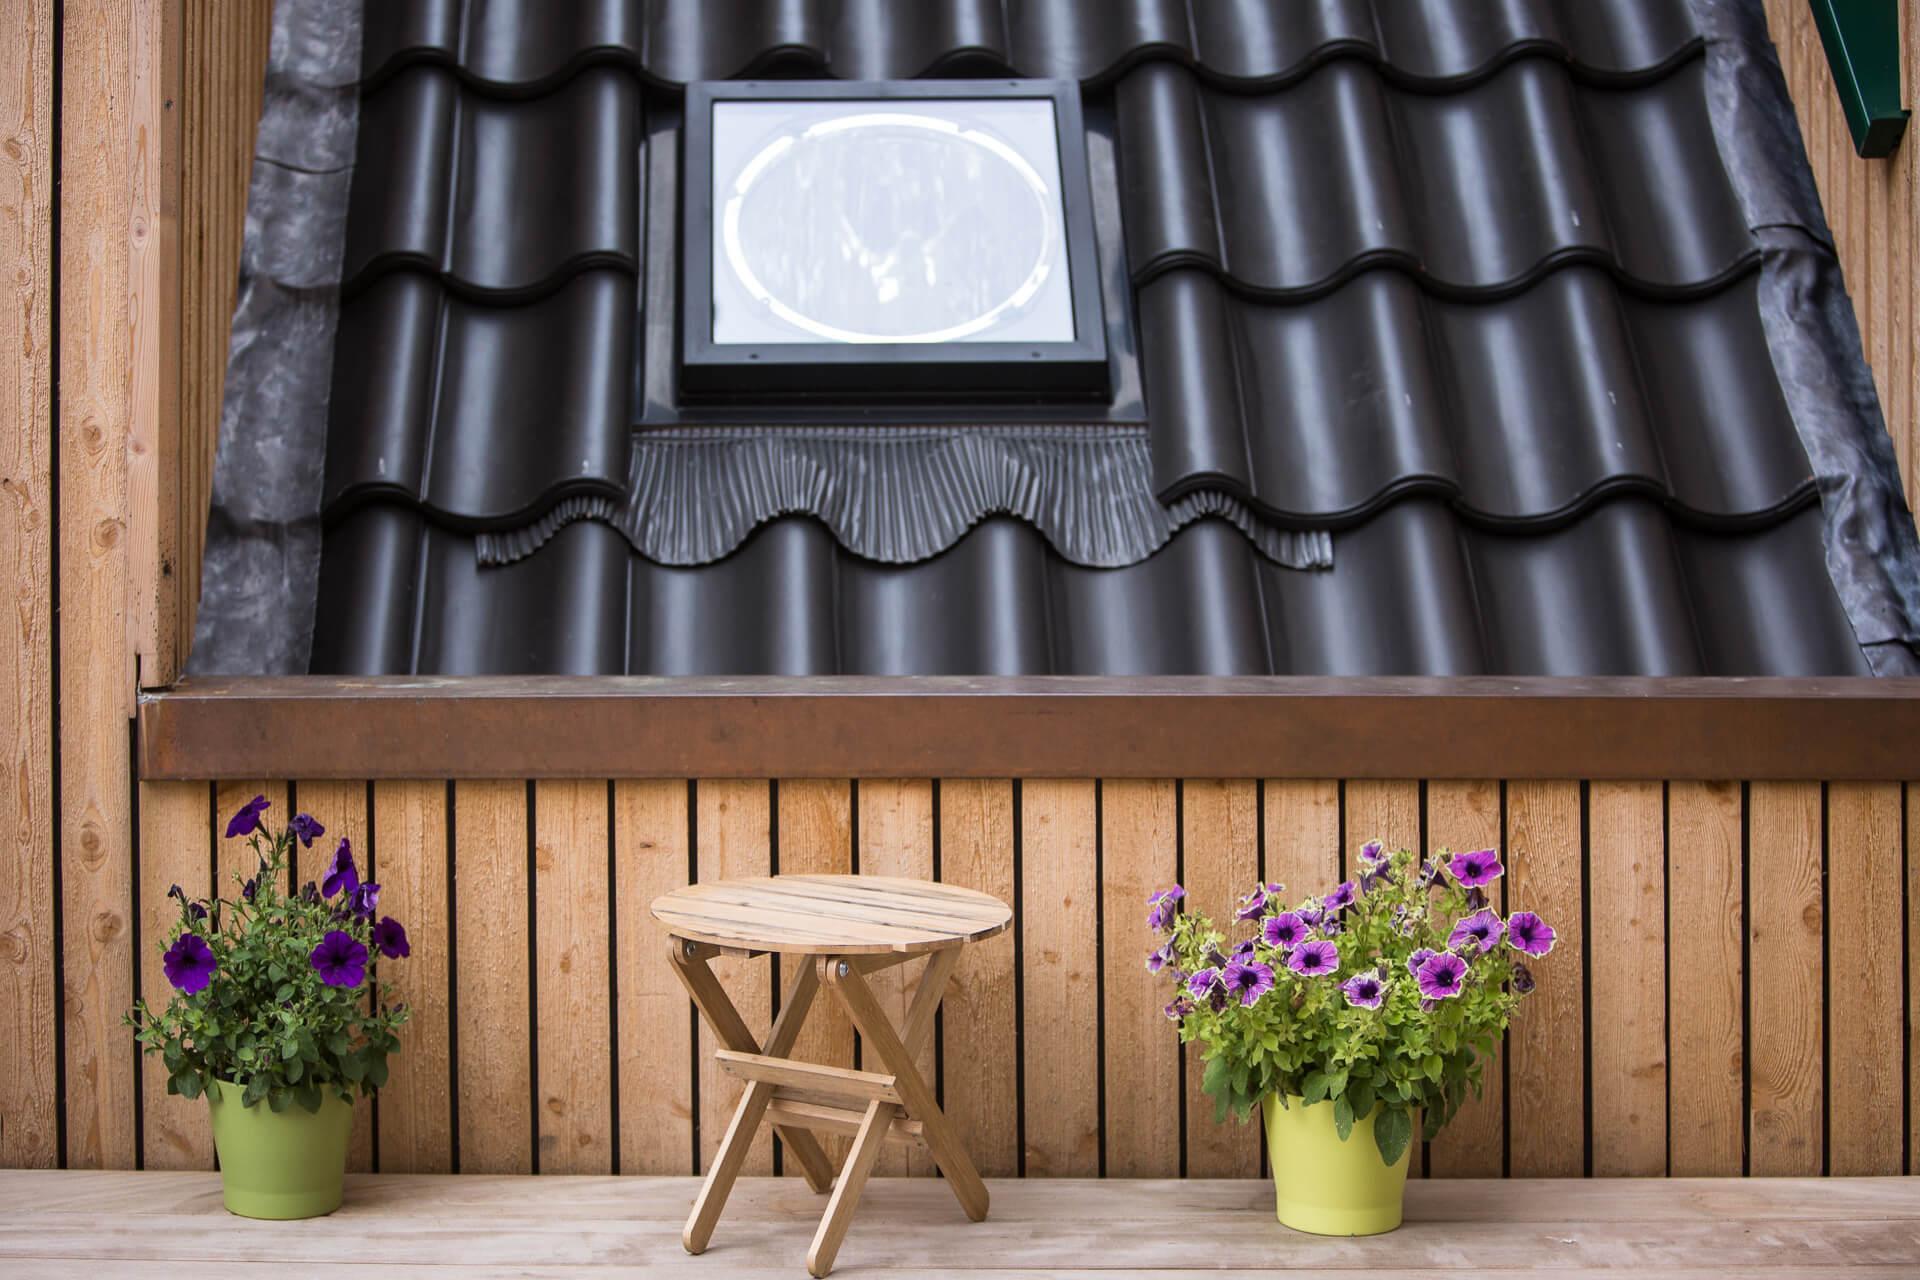 Foto Ryan Baugestaltung Anbau Francop Edelholzterrasse mit Holhocker